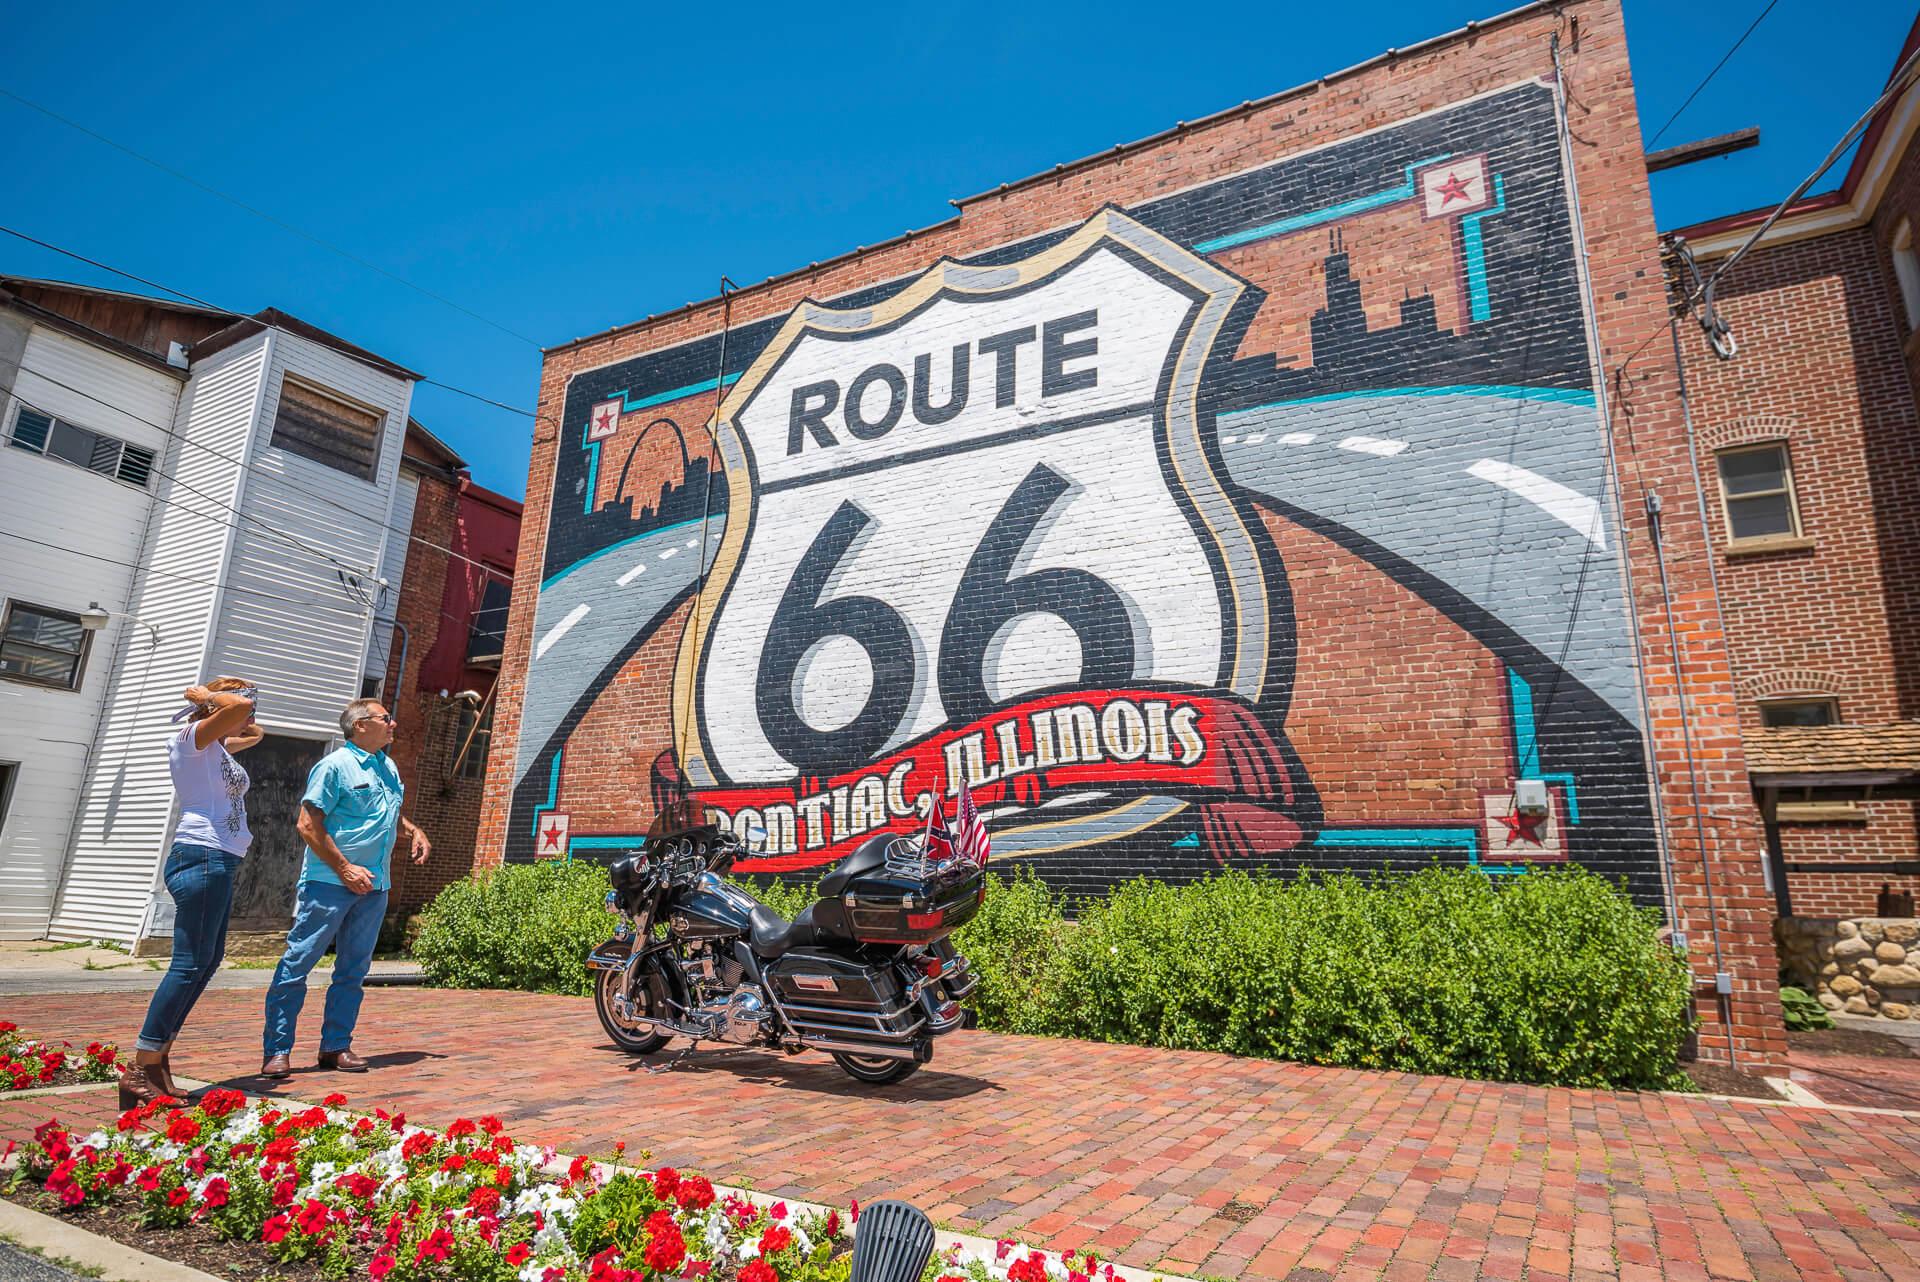 Route 66 mural in Pontiac Illinois